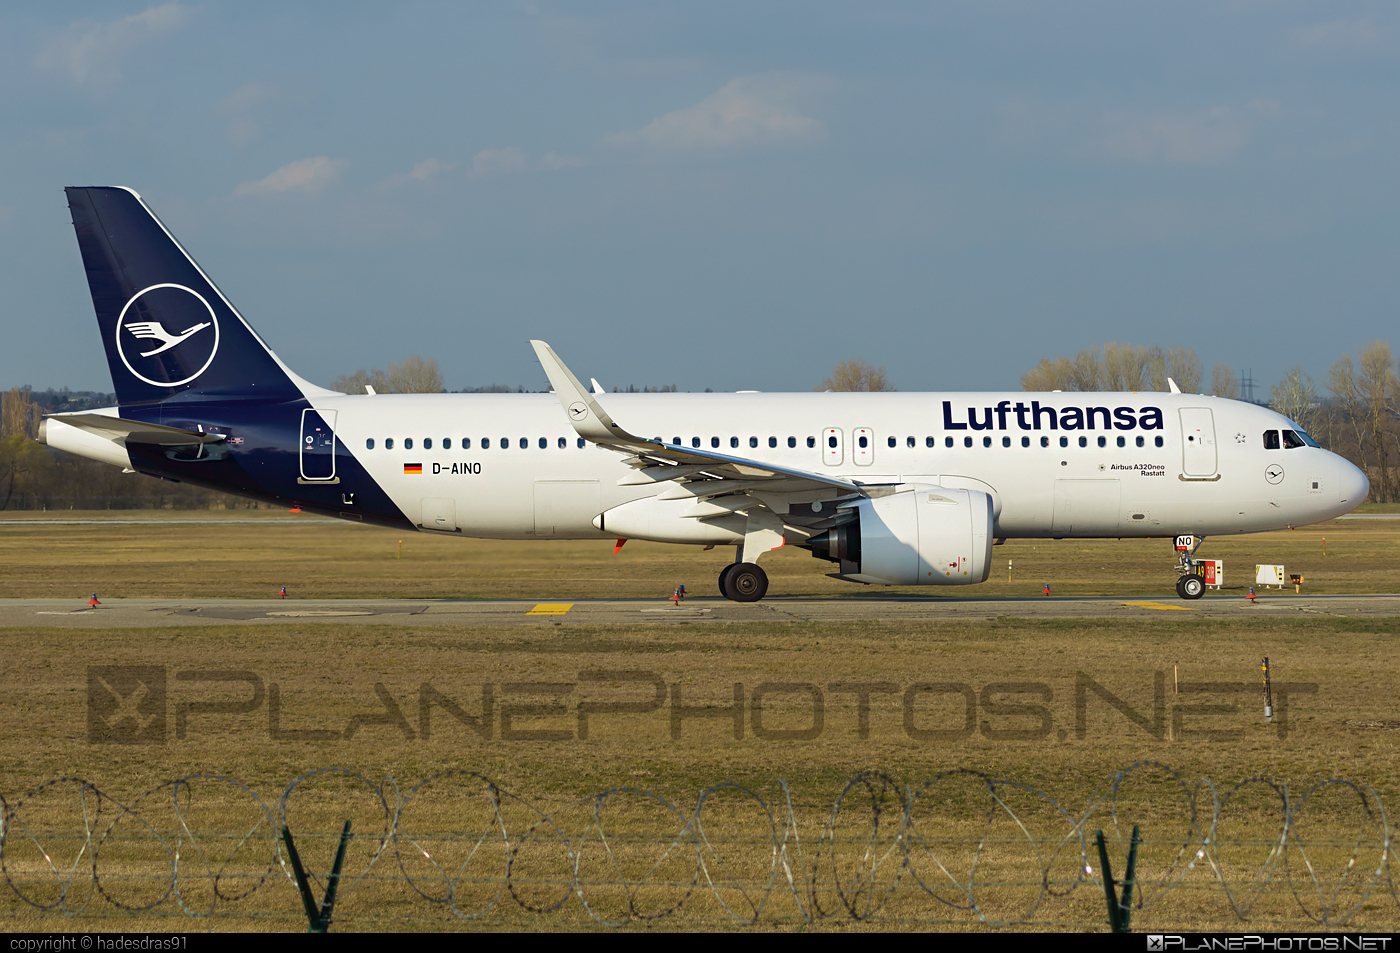 Airbus A320-271N - D-AINO operated by Lufthansa #a320 #a320family #a320neo #airbus #airbus320 #lufthansa